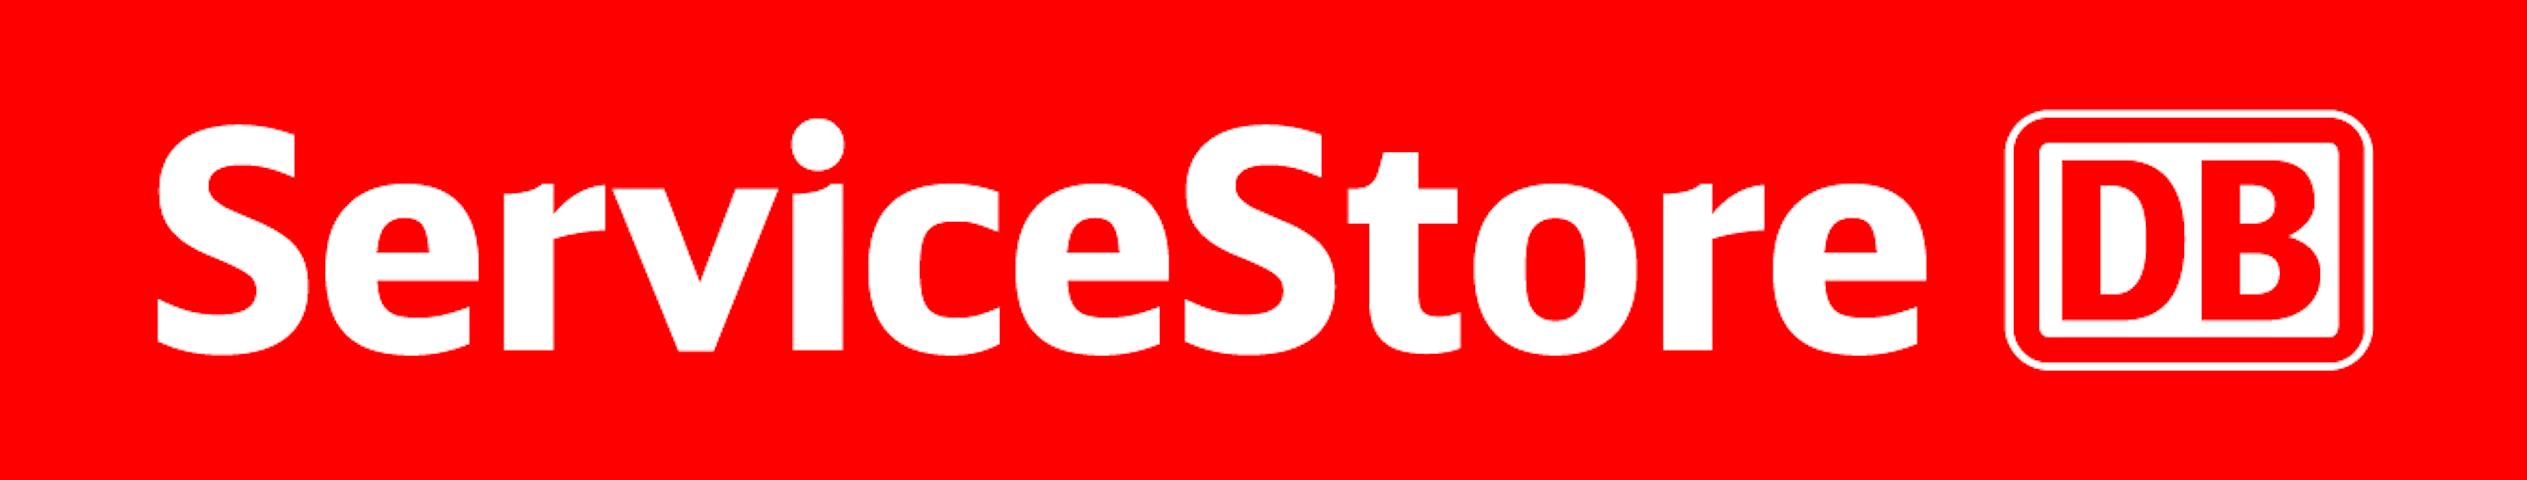 ServiceStore DB - Bahnhof Delmenhorst